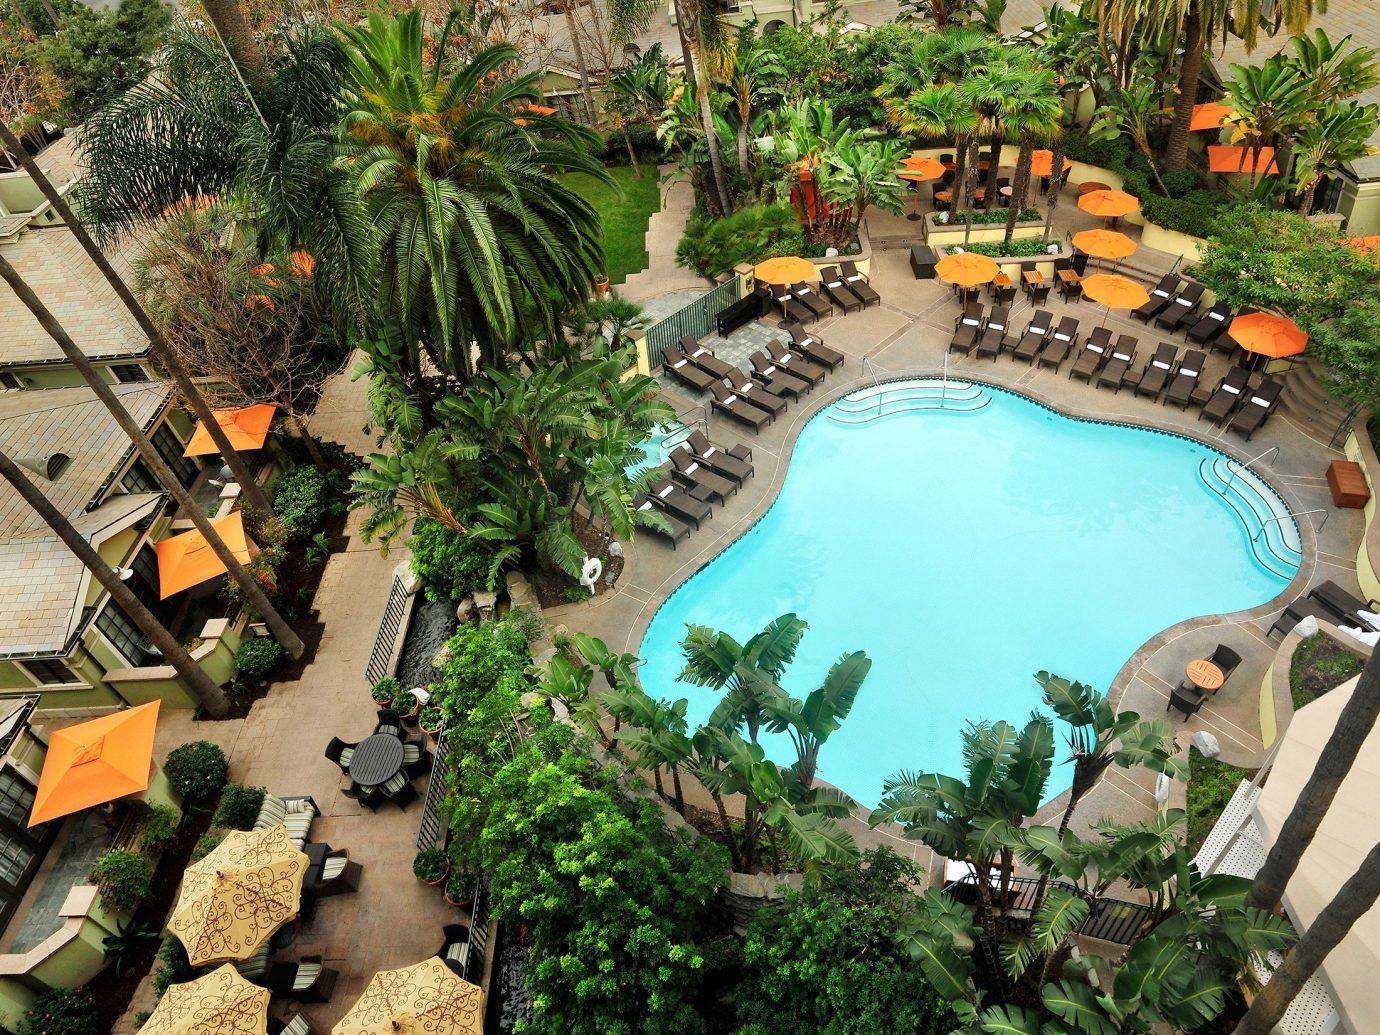 Trip Ideas tree swimming pool plant Resort estate backyard mansion Garden Jungle decorated